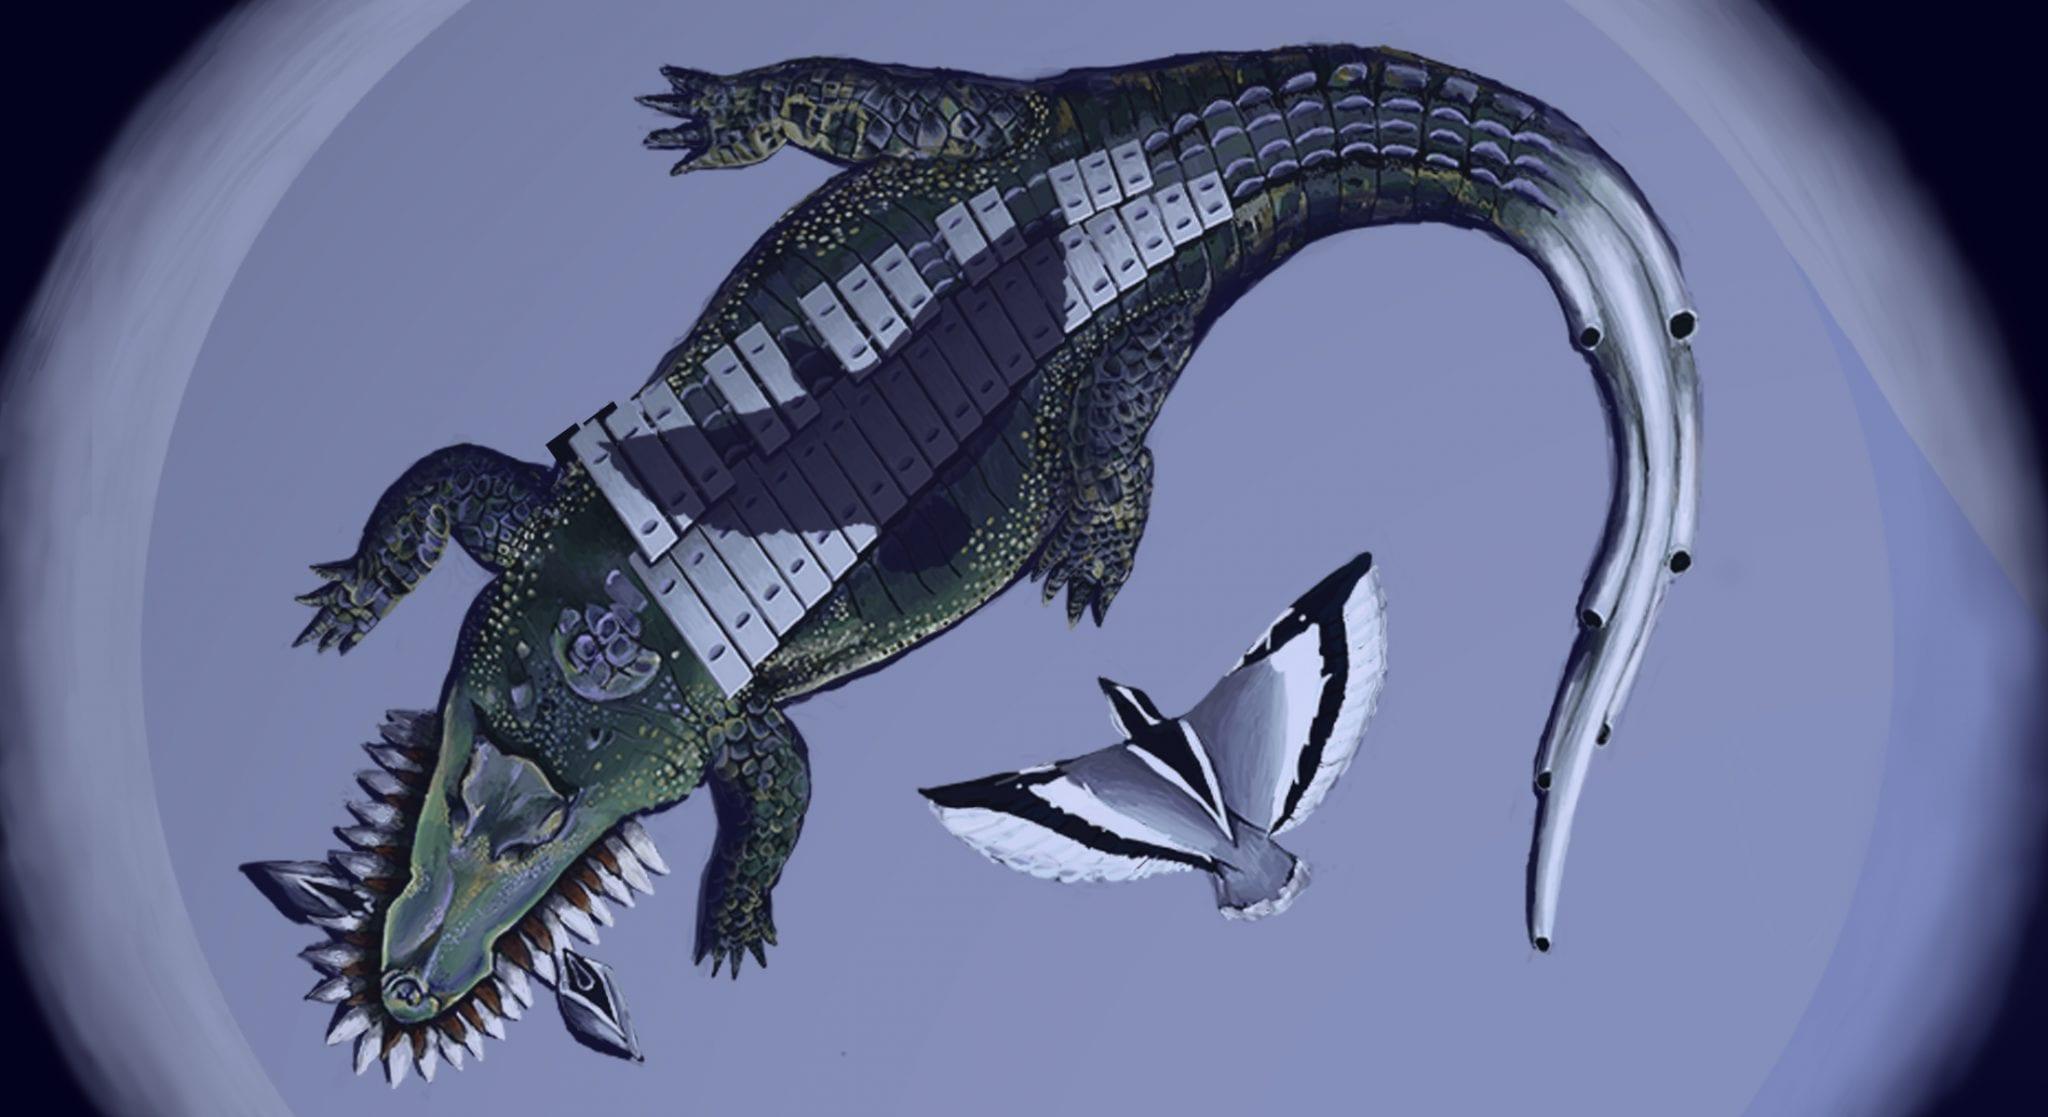 croc-piano-res-72-(cover-photo)